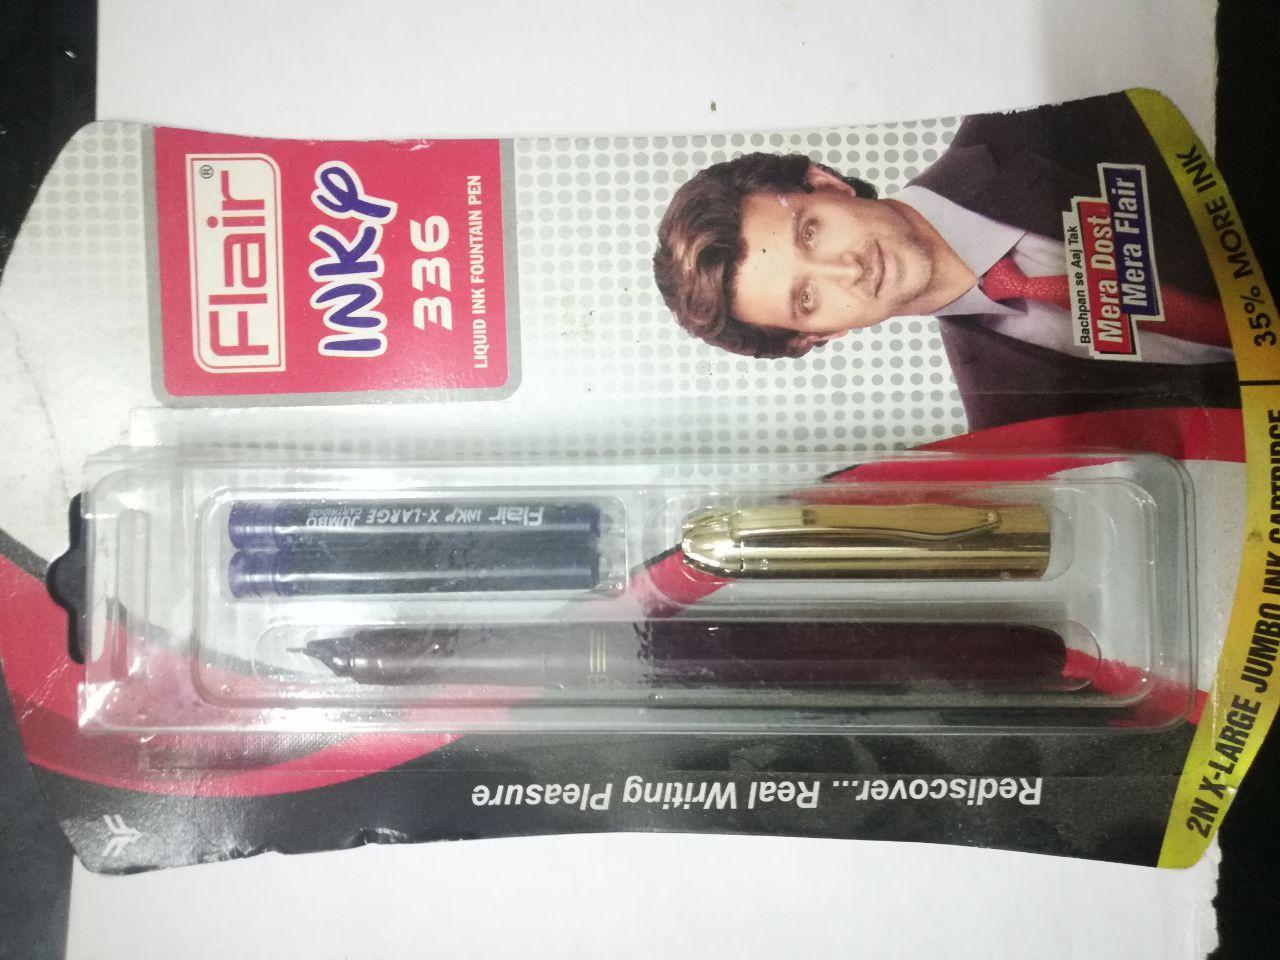 FLAIR ink pen